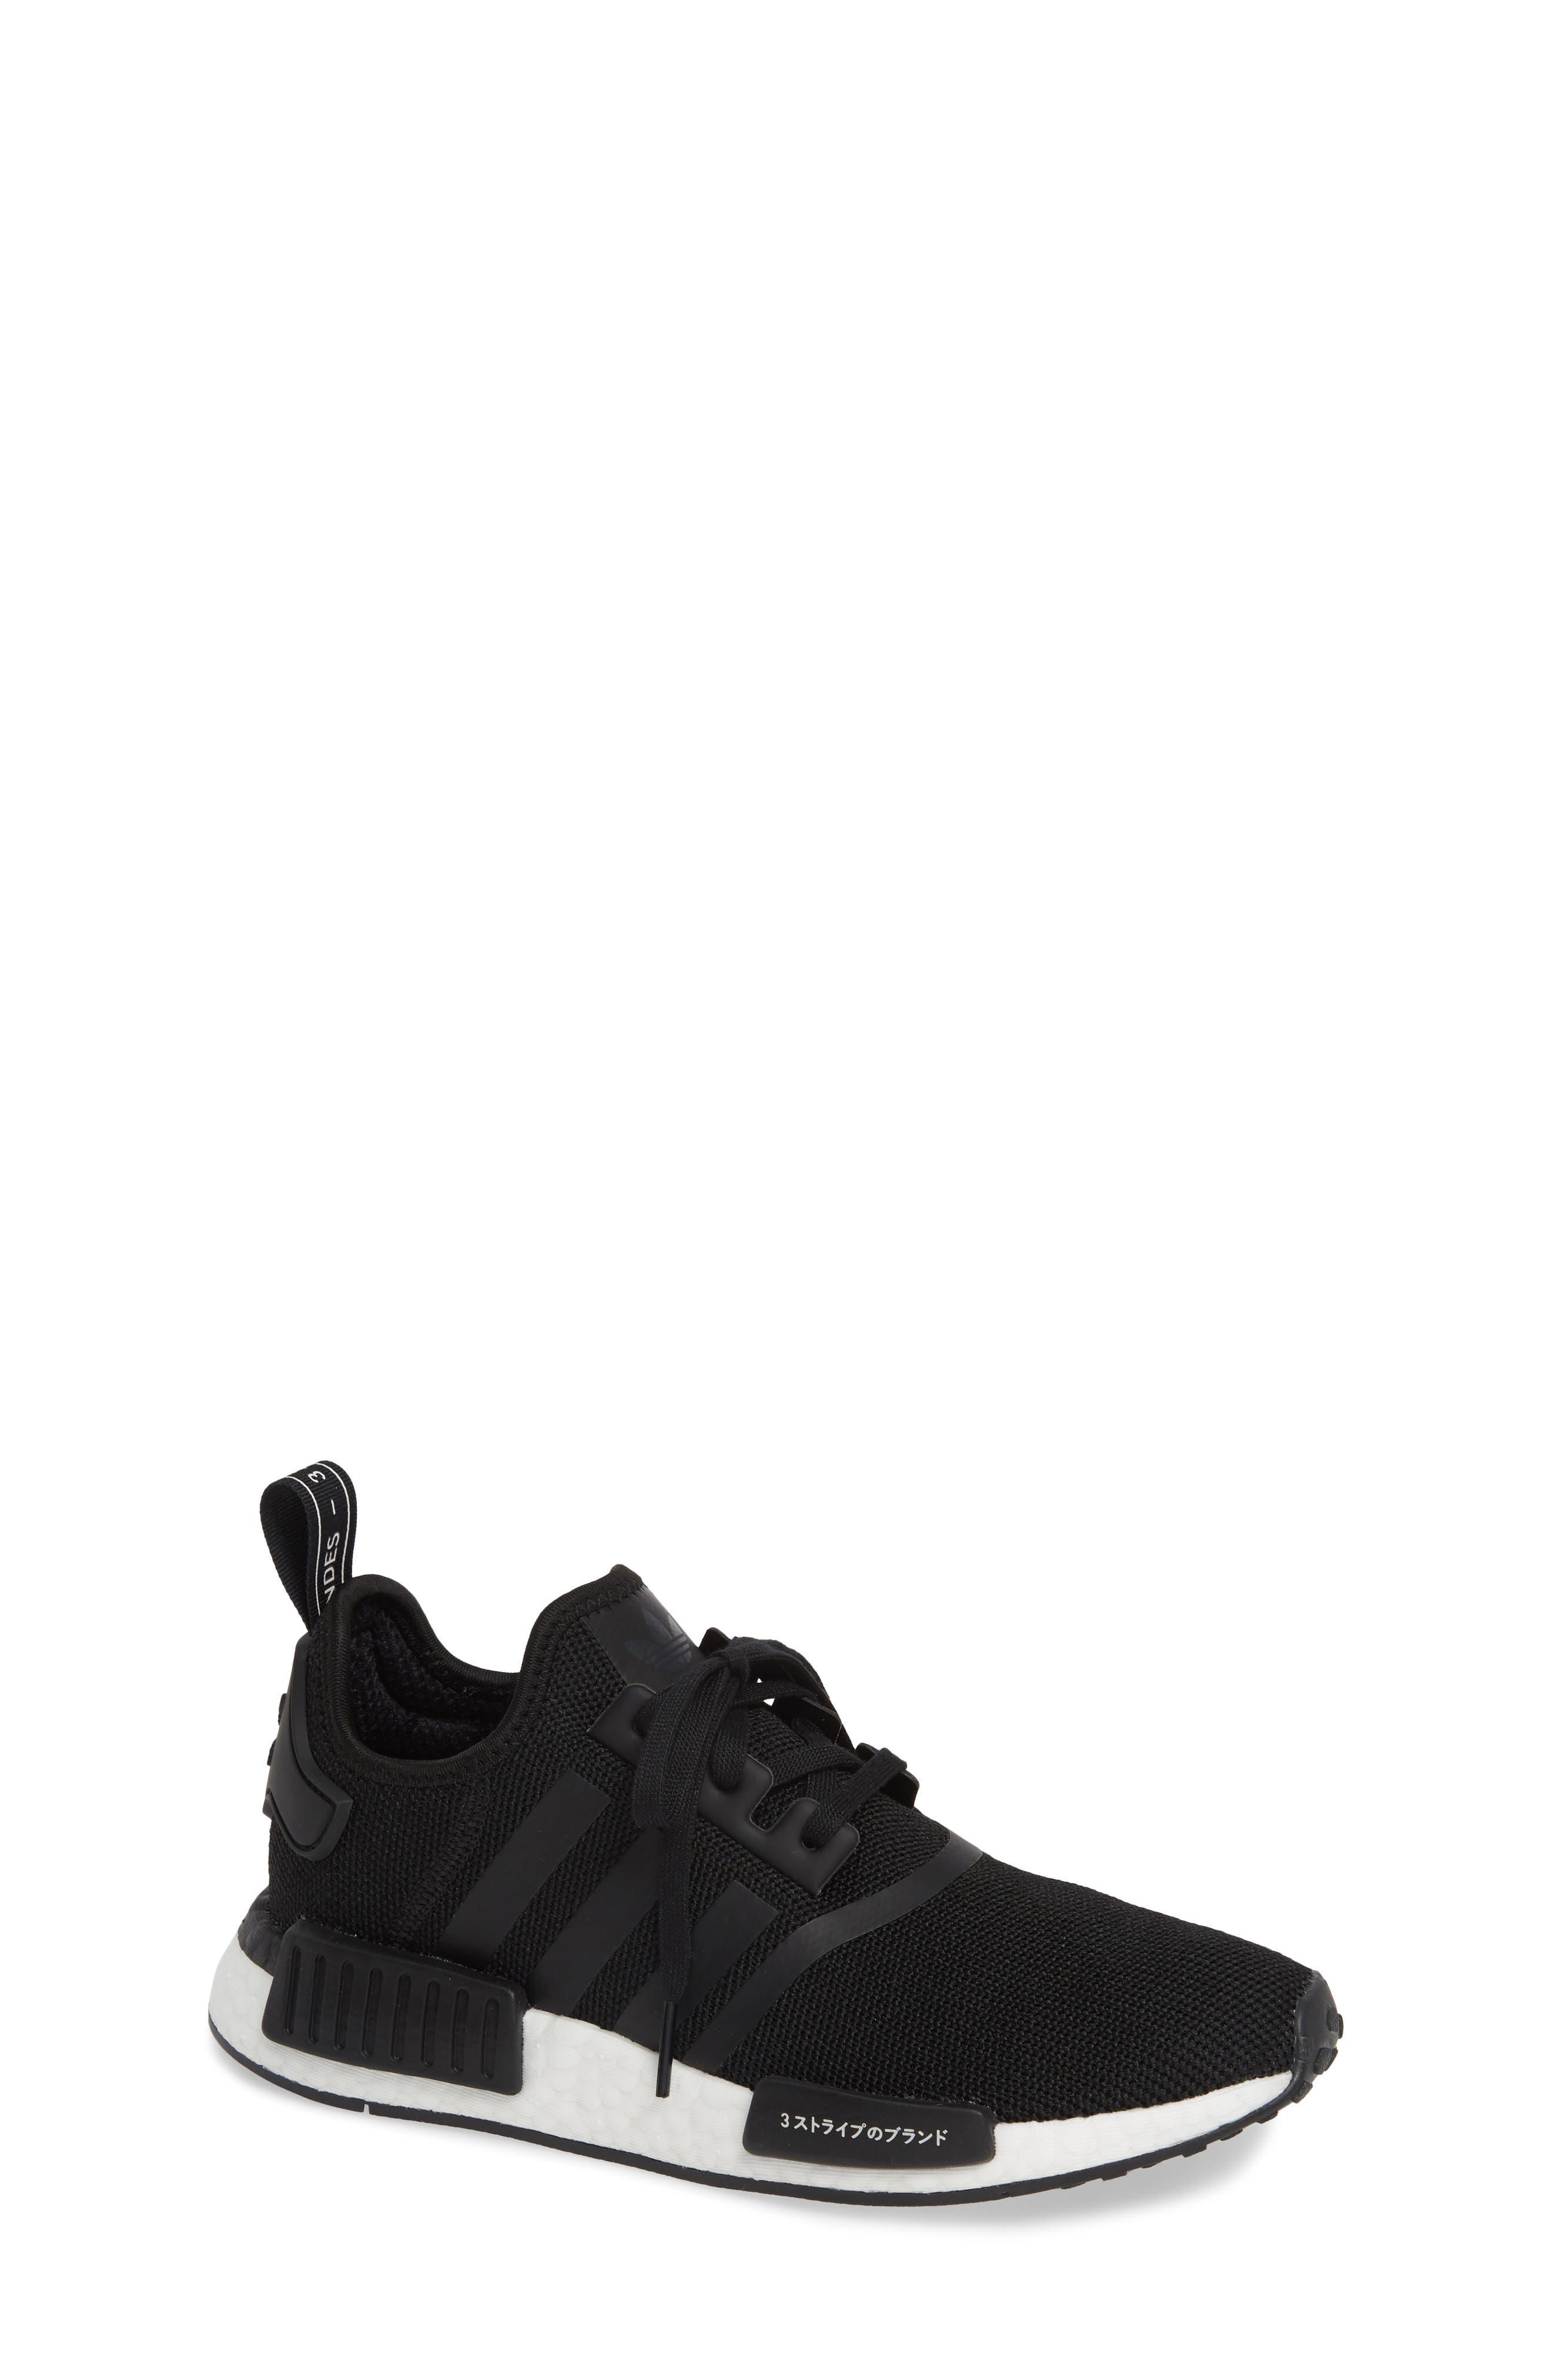 NMD R1 Sneaker,                             Main thumbnail 1, color,                             CORE BLACK/ BLACK/ ORCHID TINT